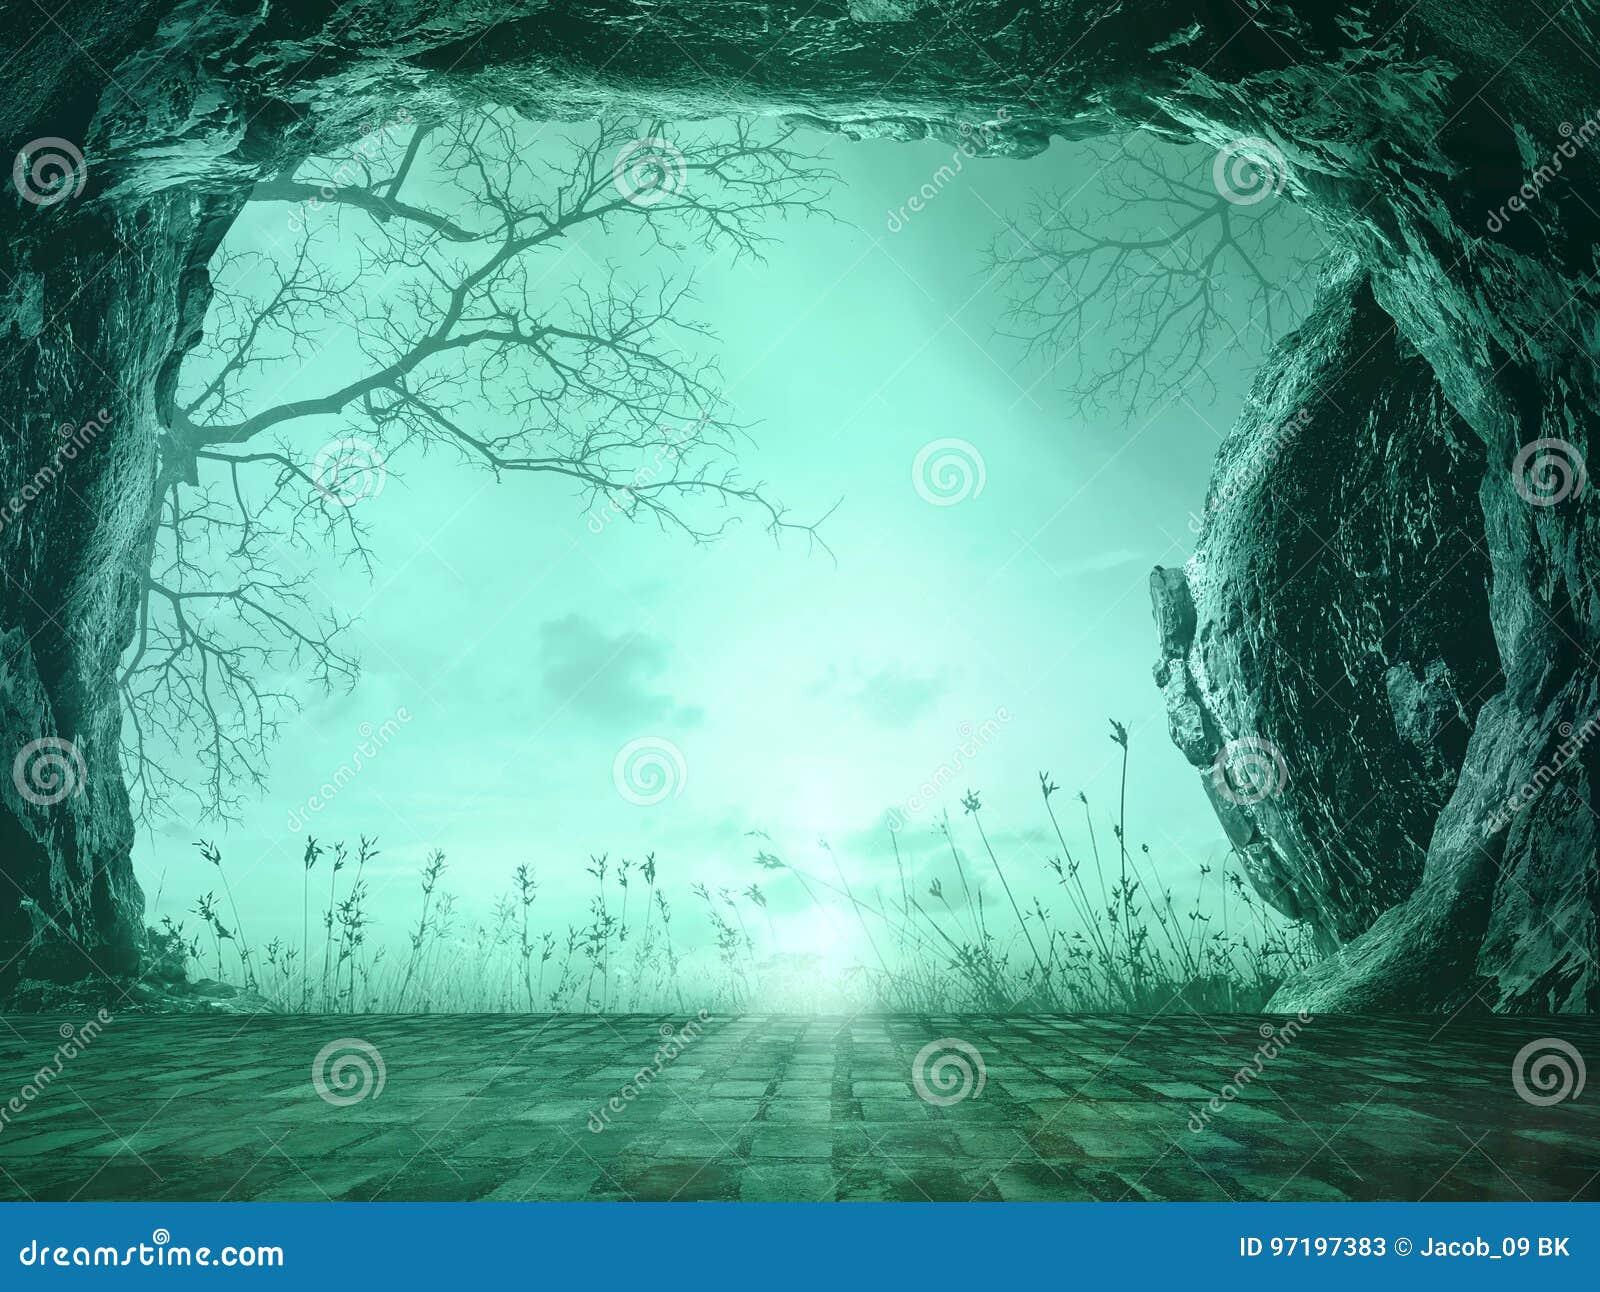 Resurrection of Jesus Christ concept